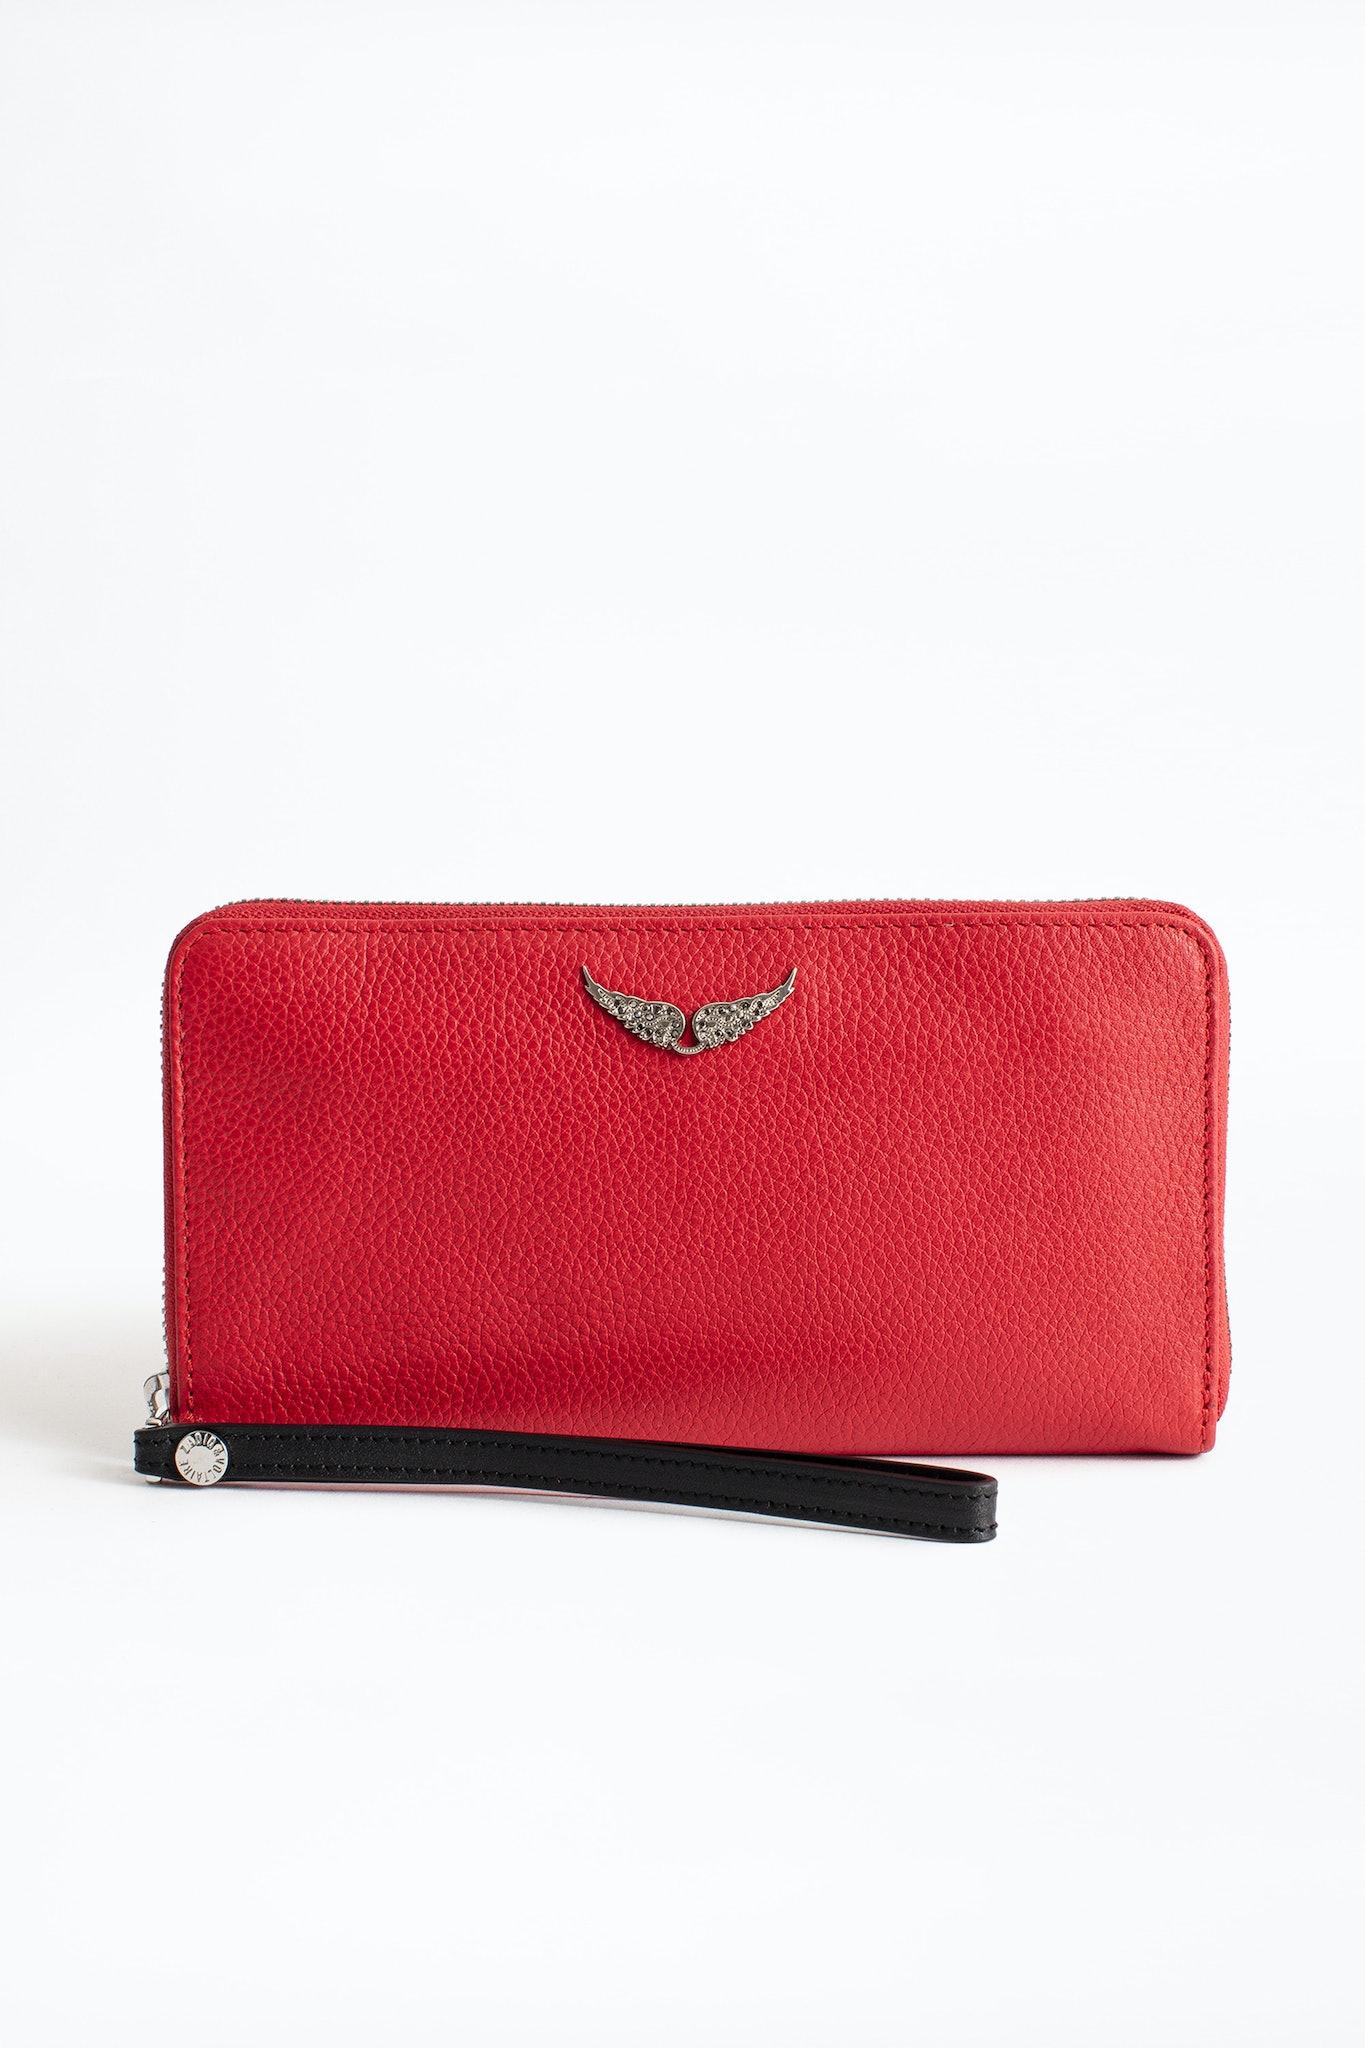 Compagnon Grained Wallet